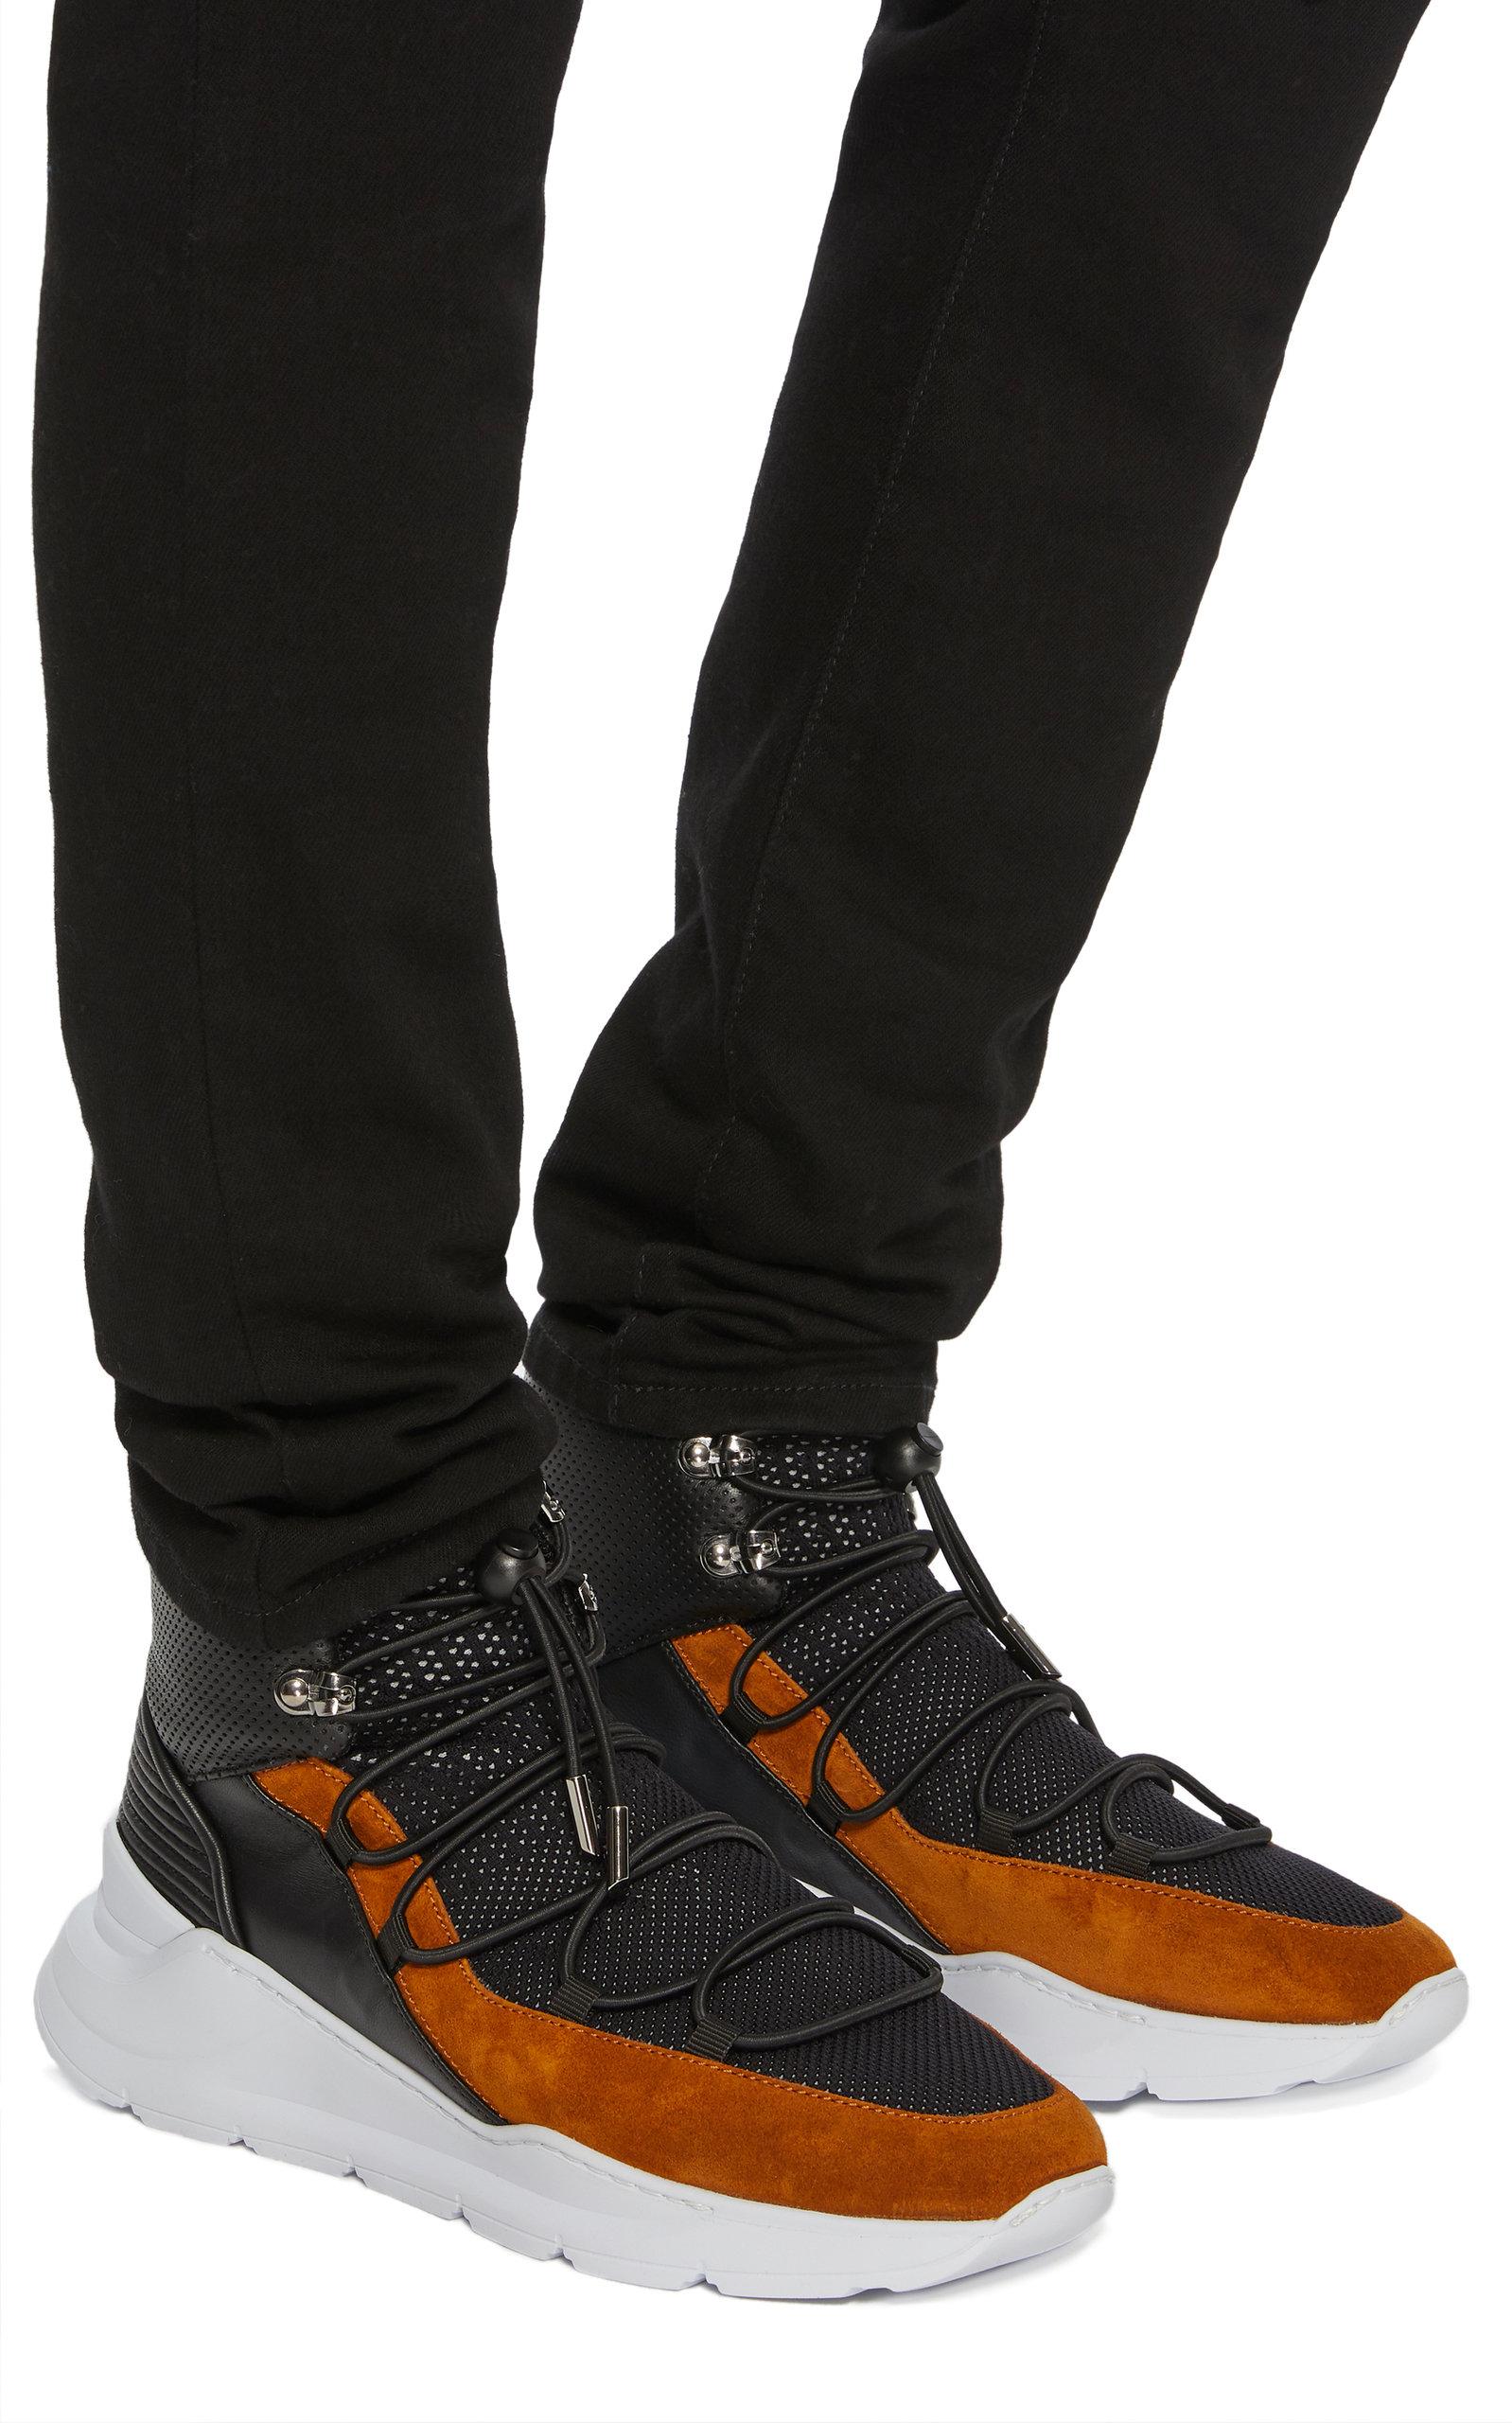 Balmain High By Leather Knit Moda Jasper Operandi Top And Sneakers 1xqtEw0Y